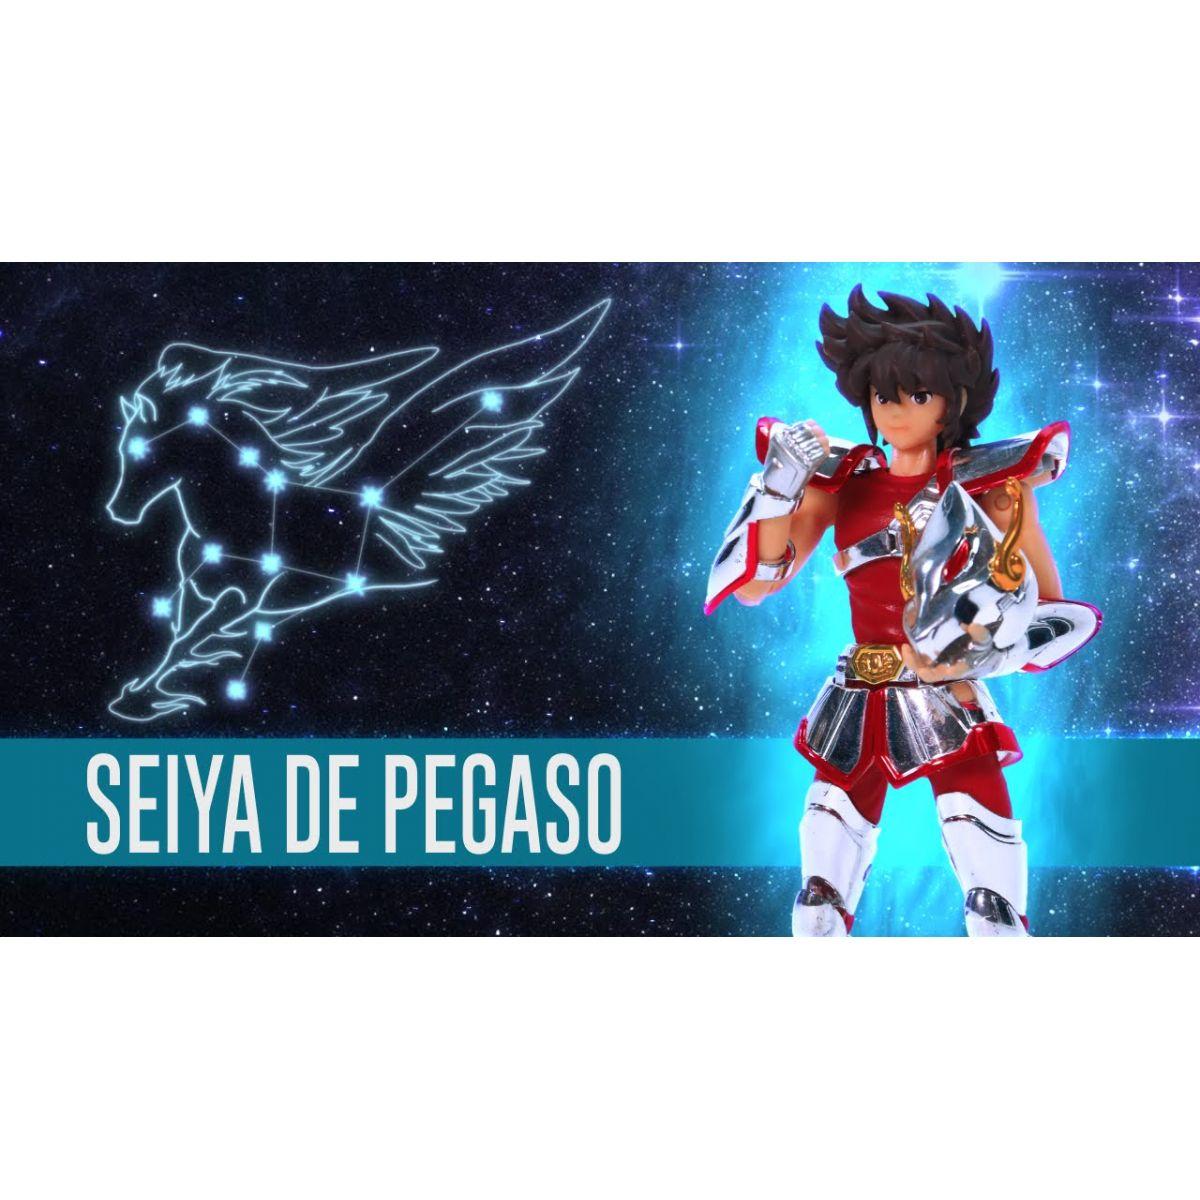 Saint Seiya Pegasus Seiya DD Panoramation - Bandai